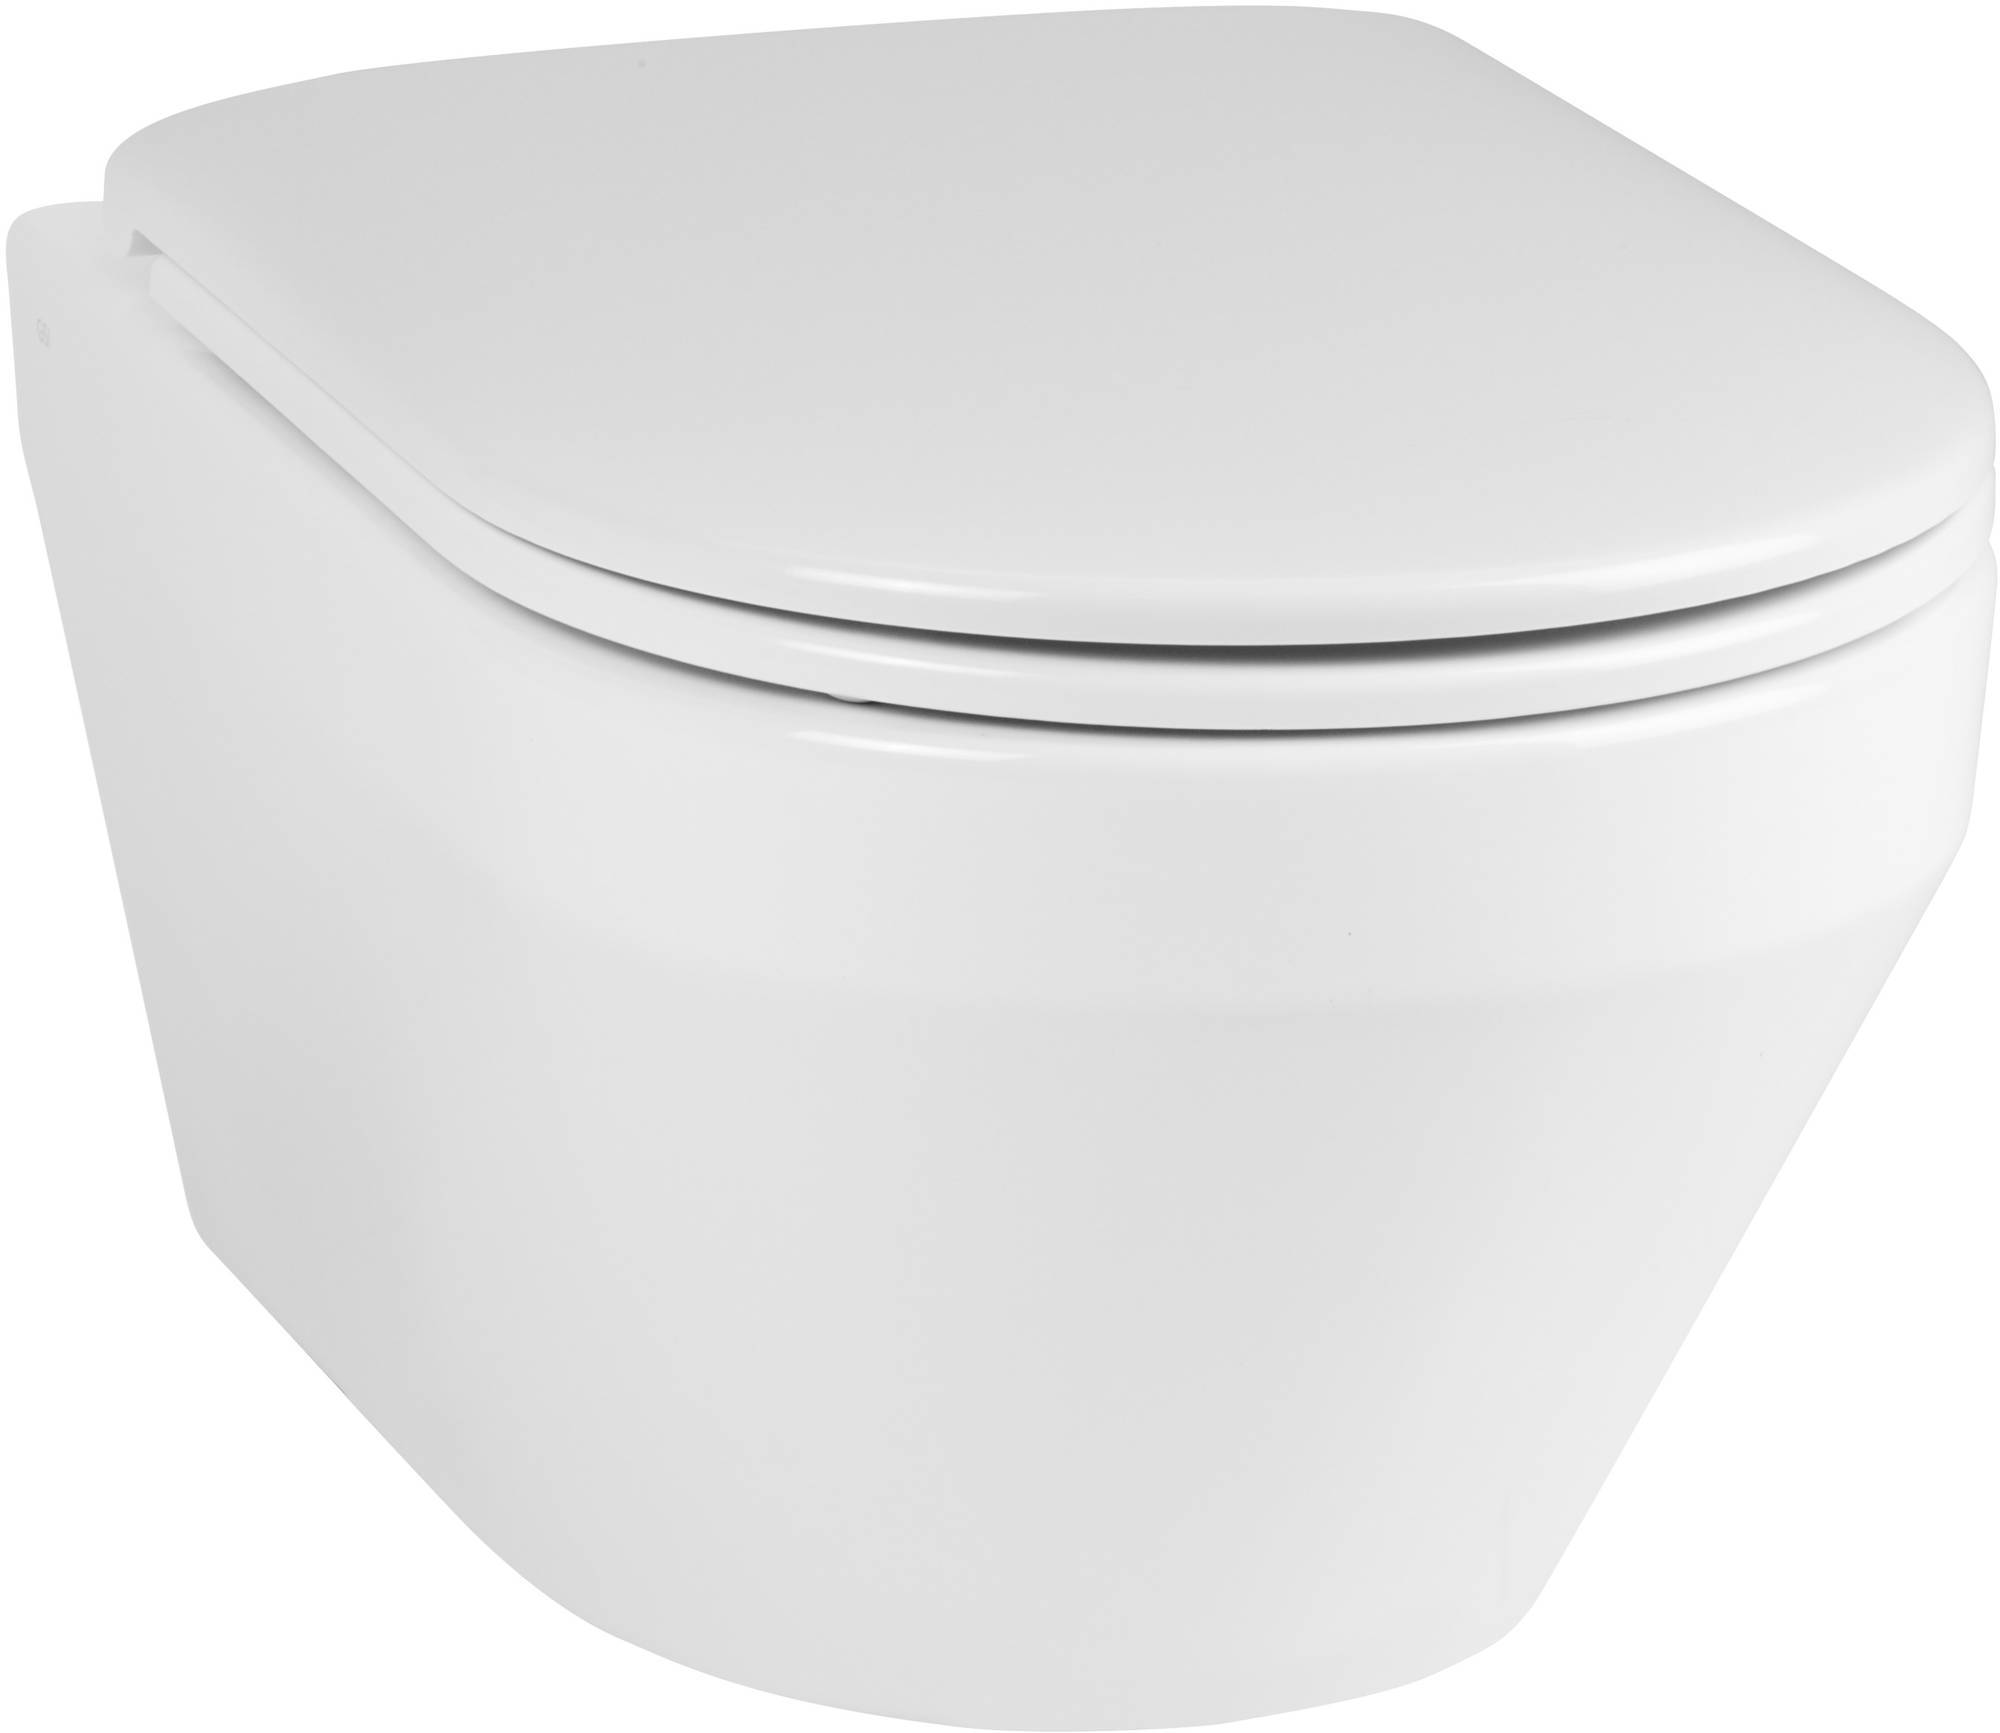 Ben Scuro wandcloset 36x55x33,5 cm Free Flush met bevestiging wit